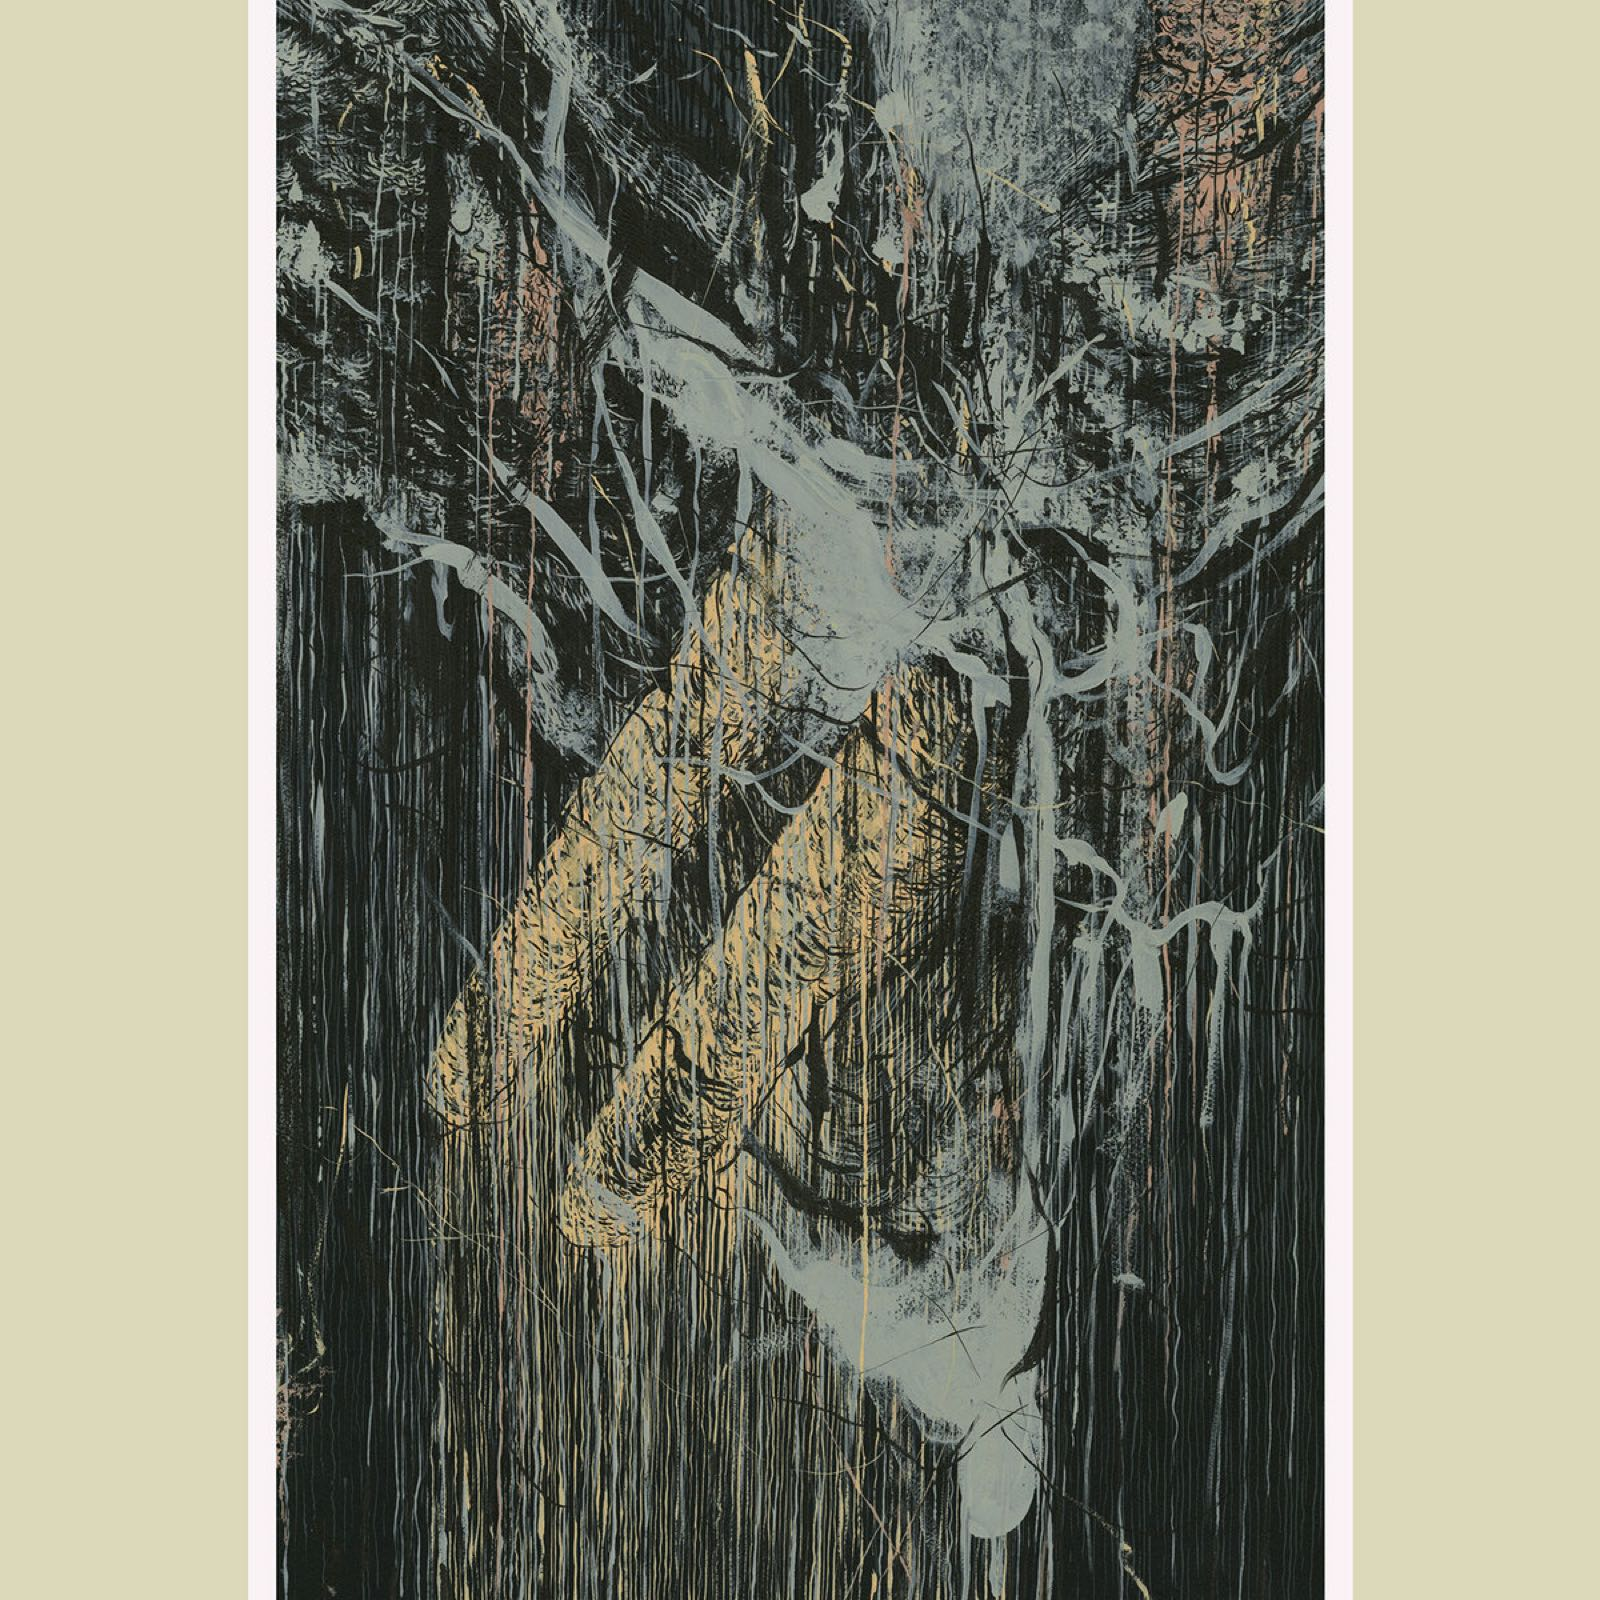 Sumac - May You Be Held [LTD 2xLP] (tan with black splatter Vinyl)